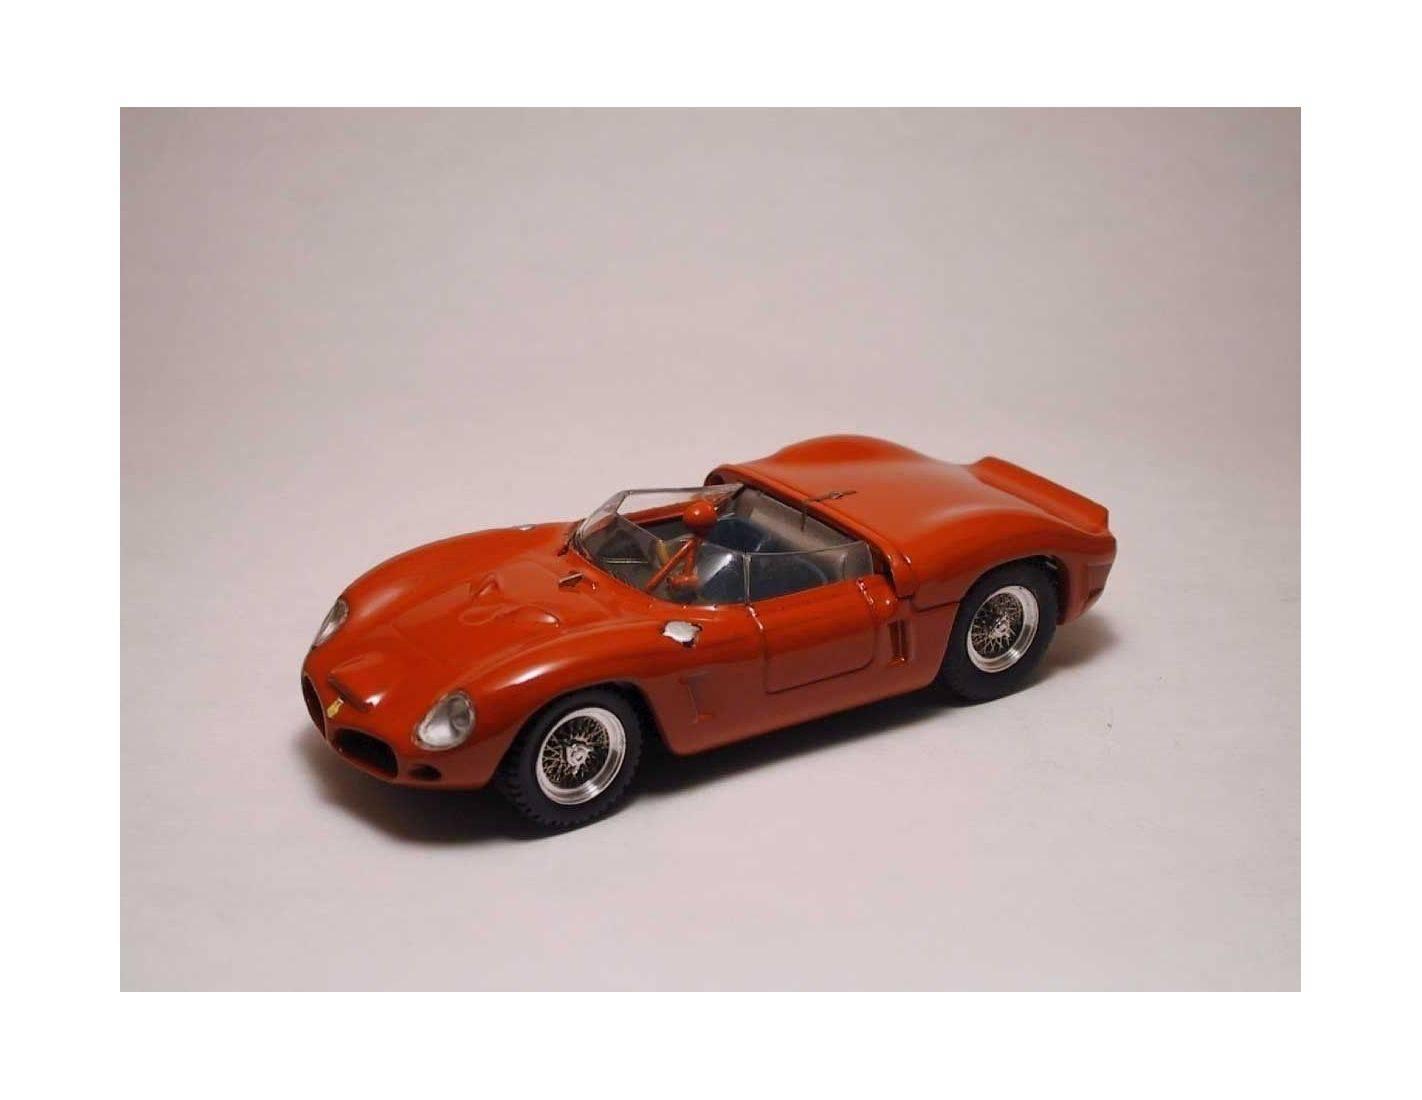 Art Model AM0020 FERRARI DINO SP 1962 RED 1:43 Modellino